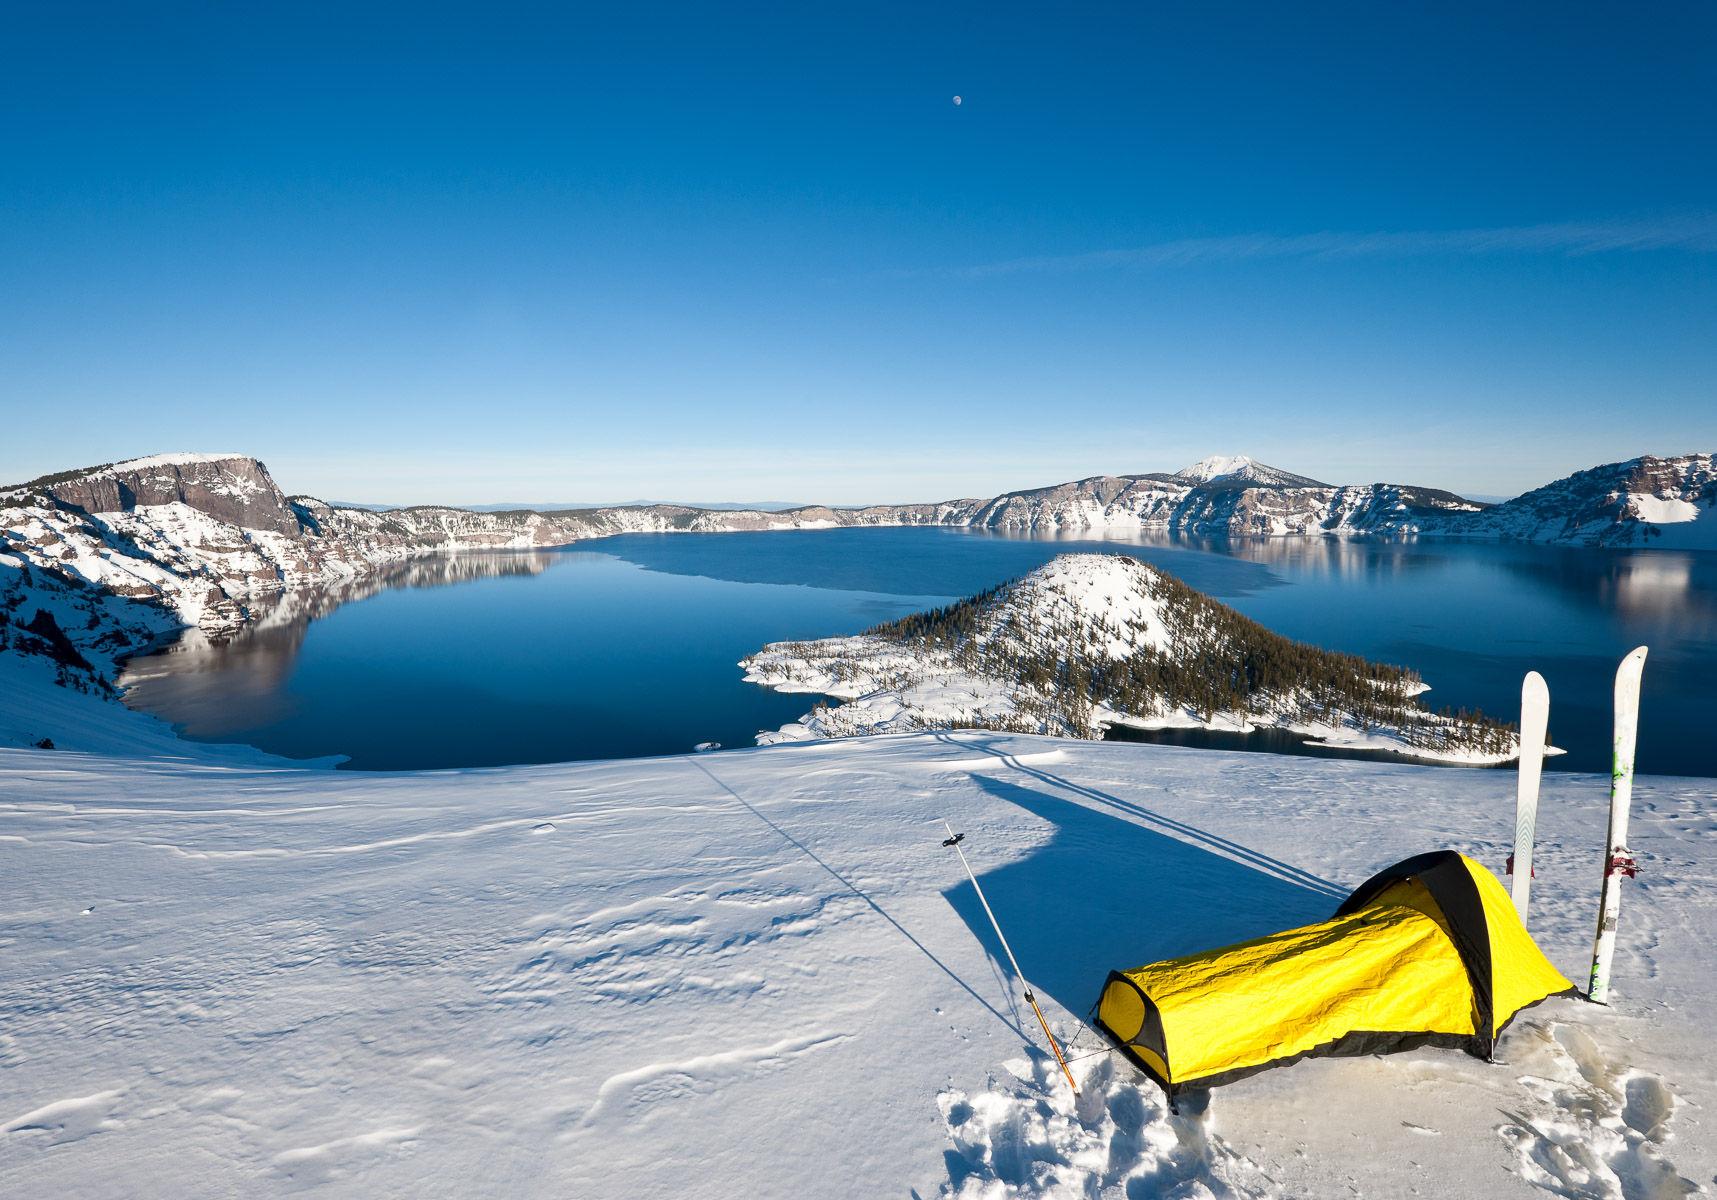 Winter Ski Camping at Crater Lake